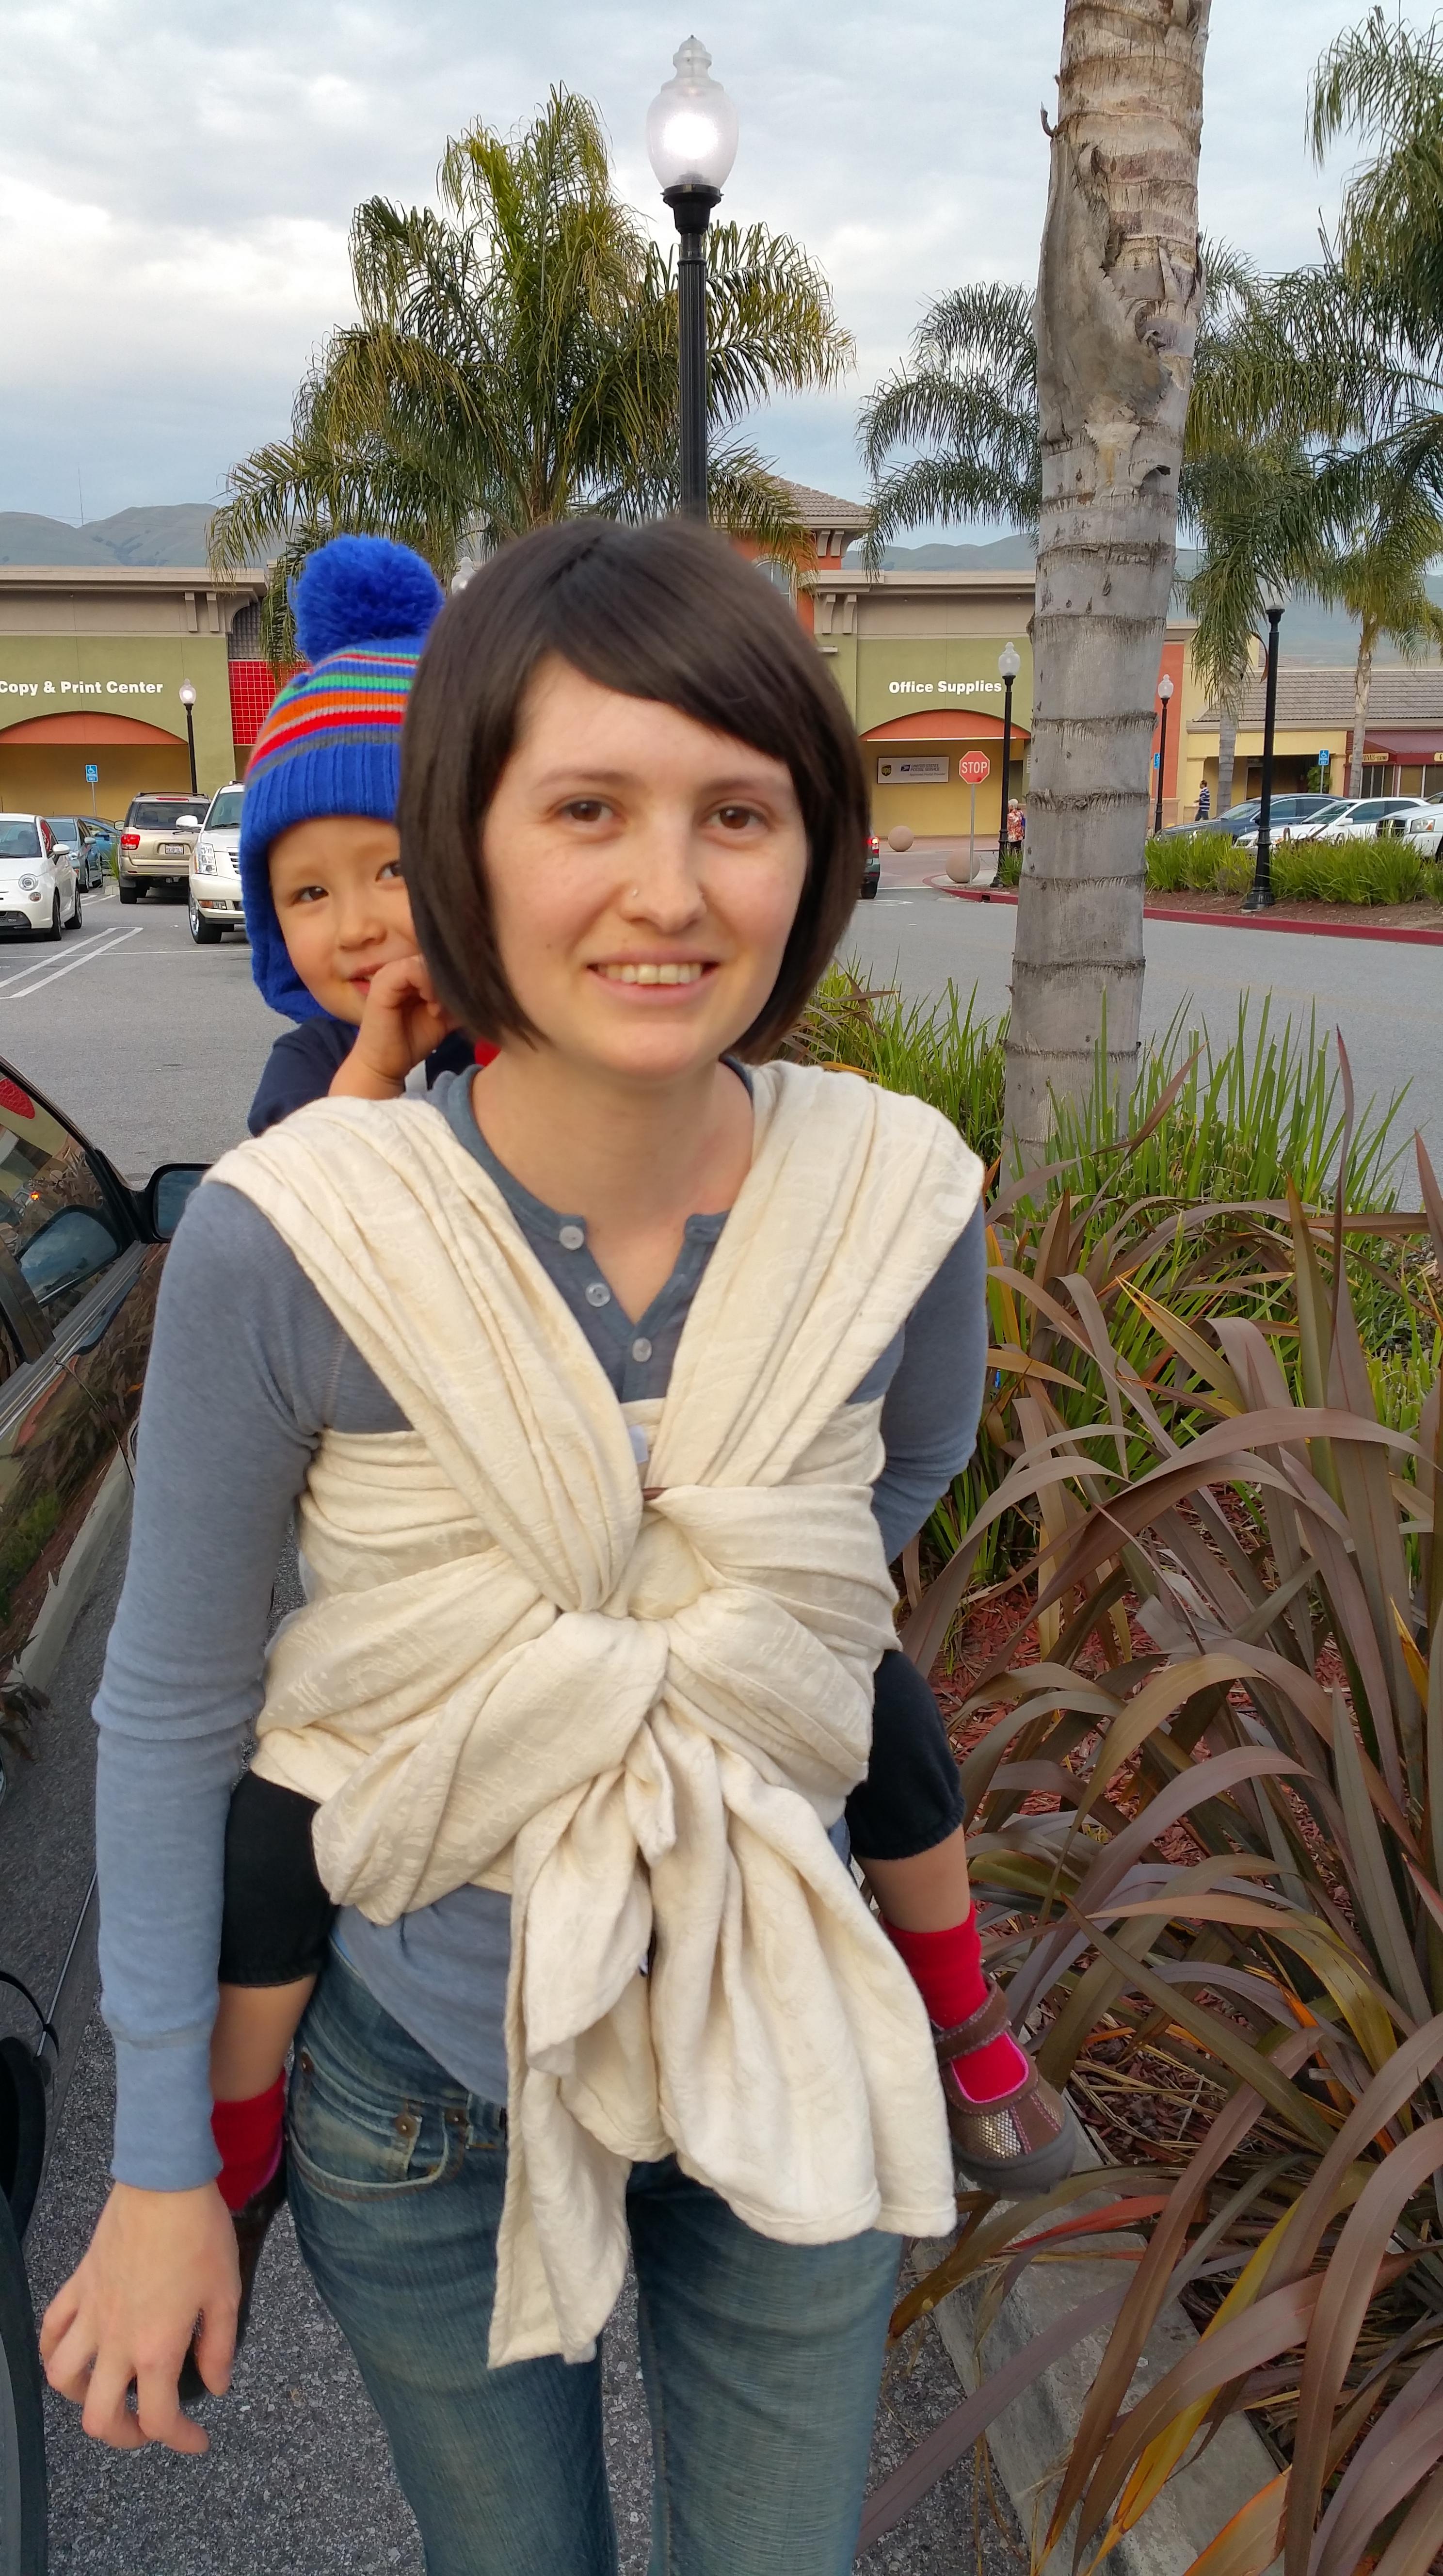 So You Want To Buy A Woven Modern Babywearing